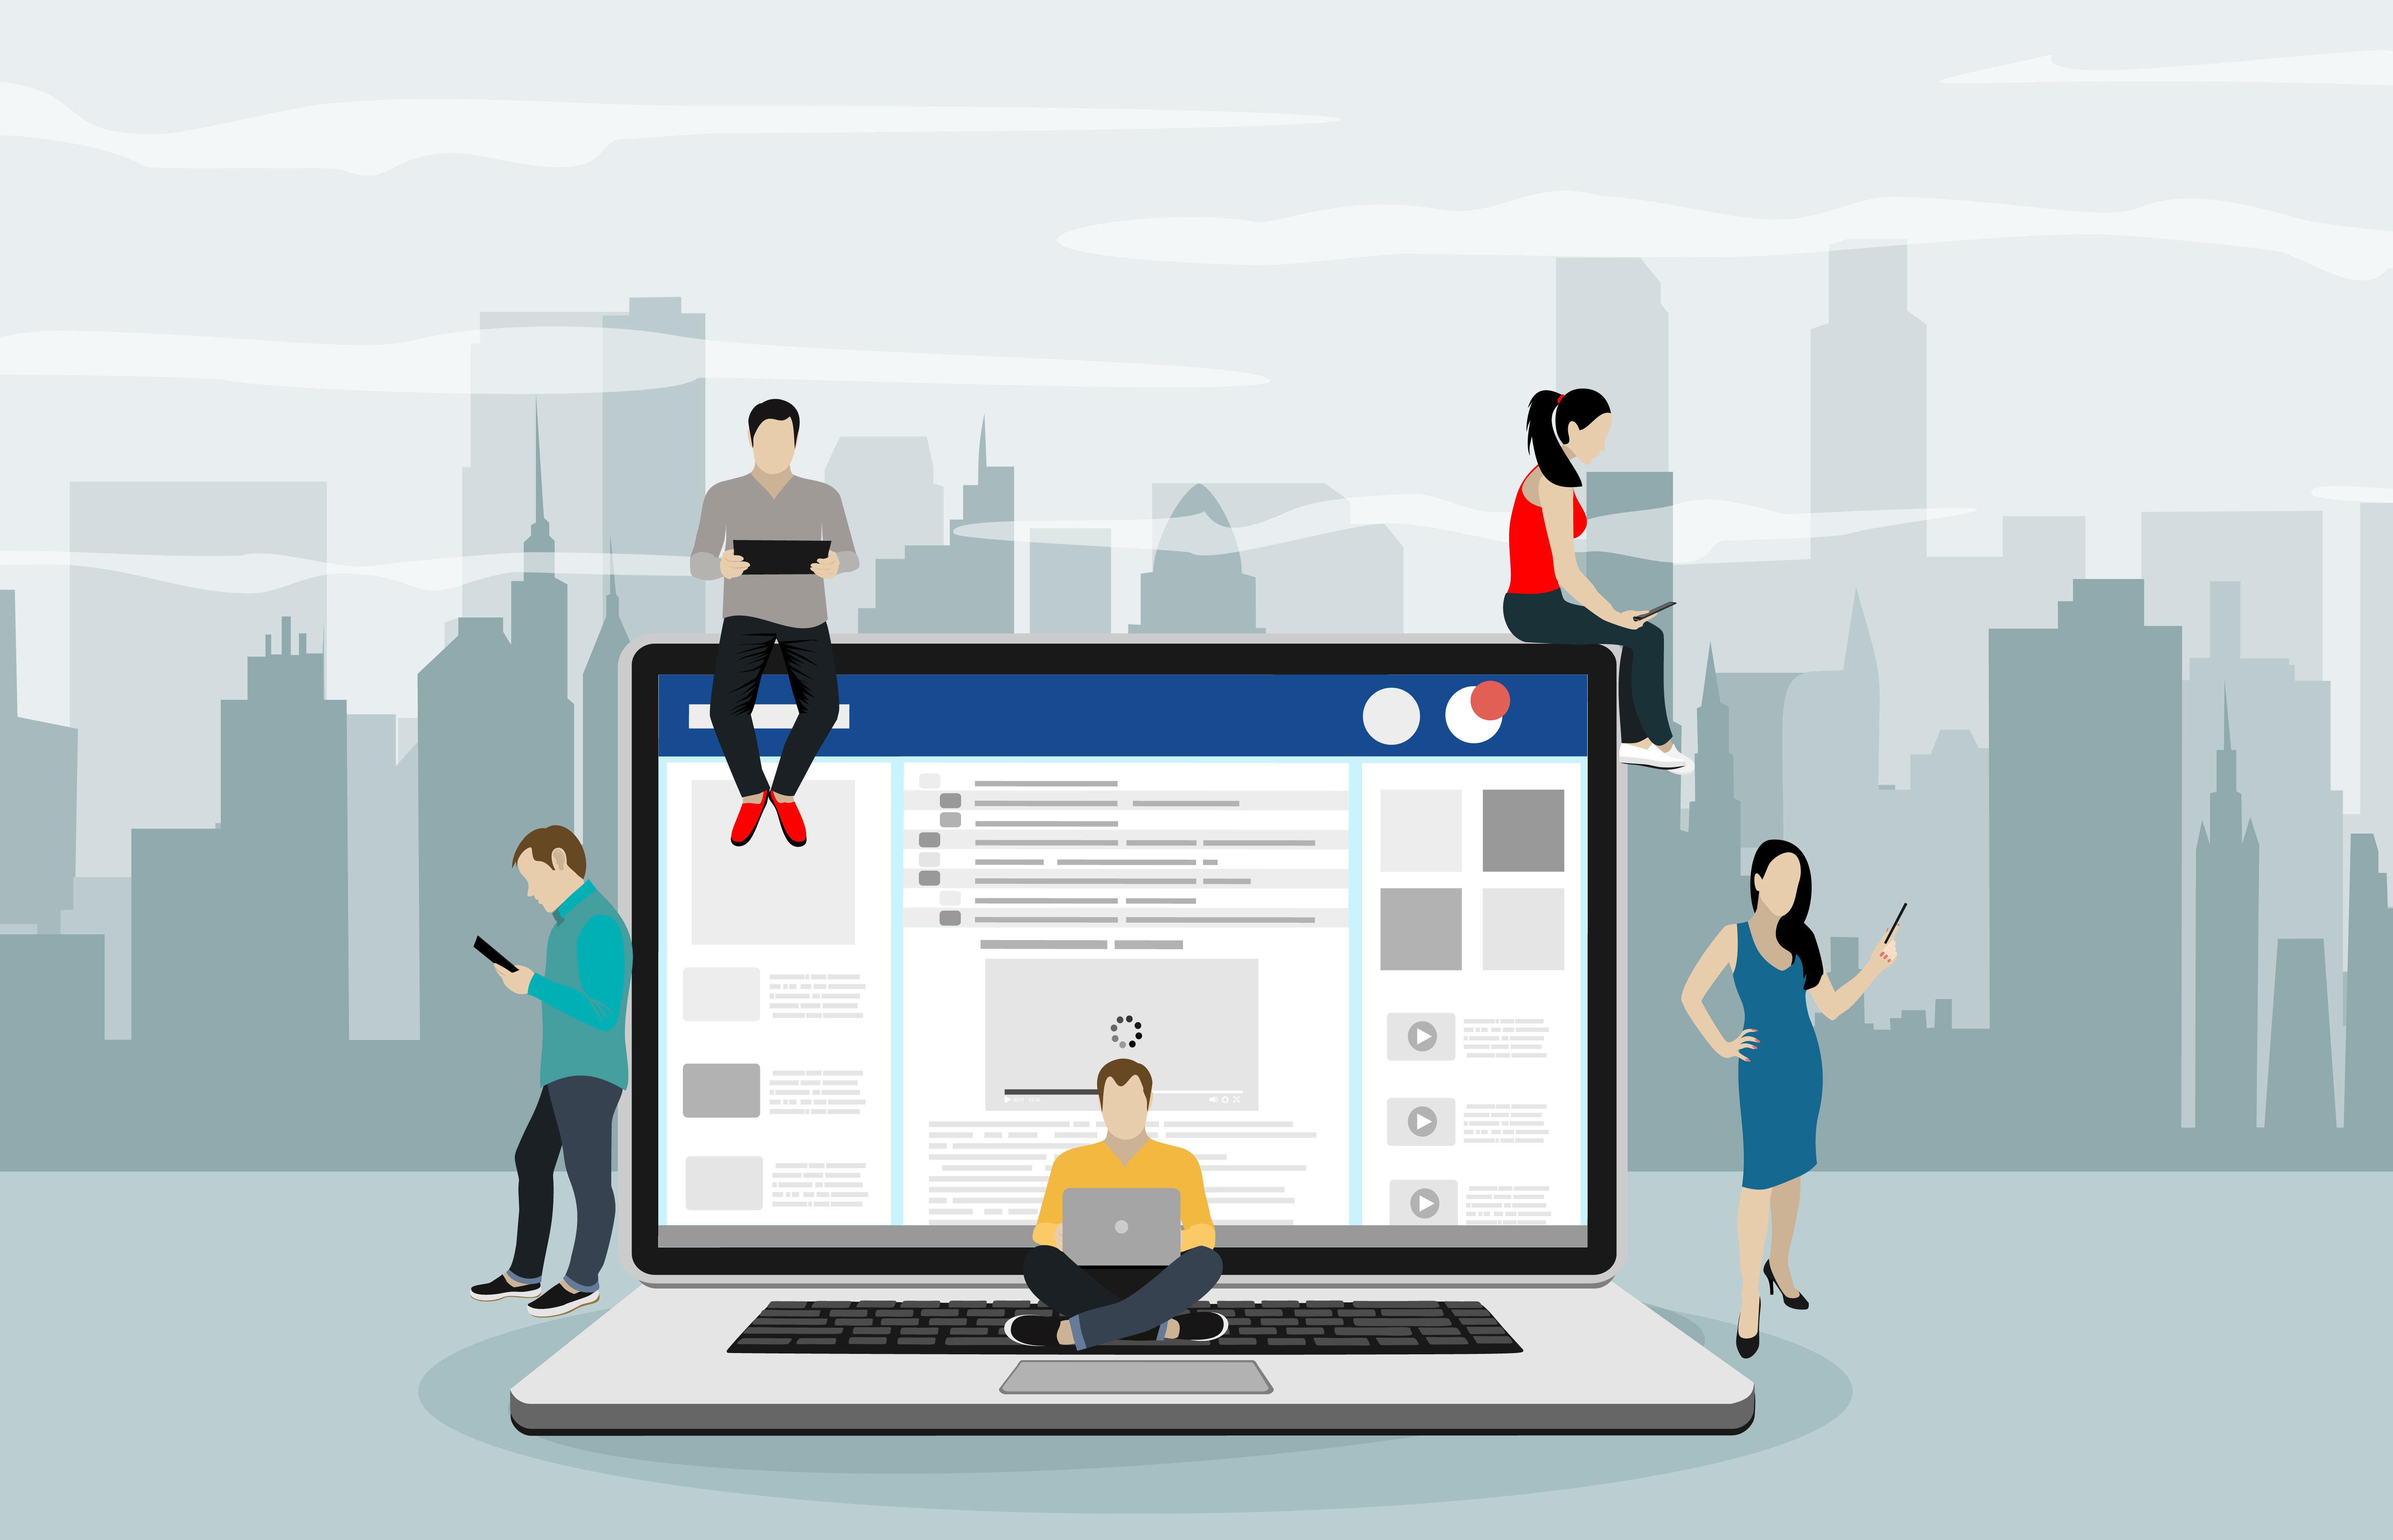 Zainstaluj piksel Facebooka i osiągaj sukcesy!